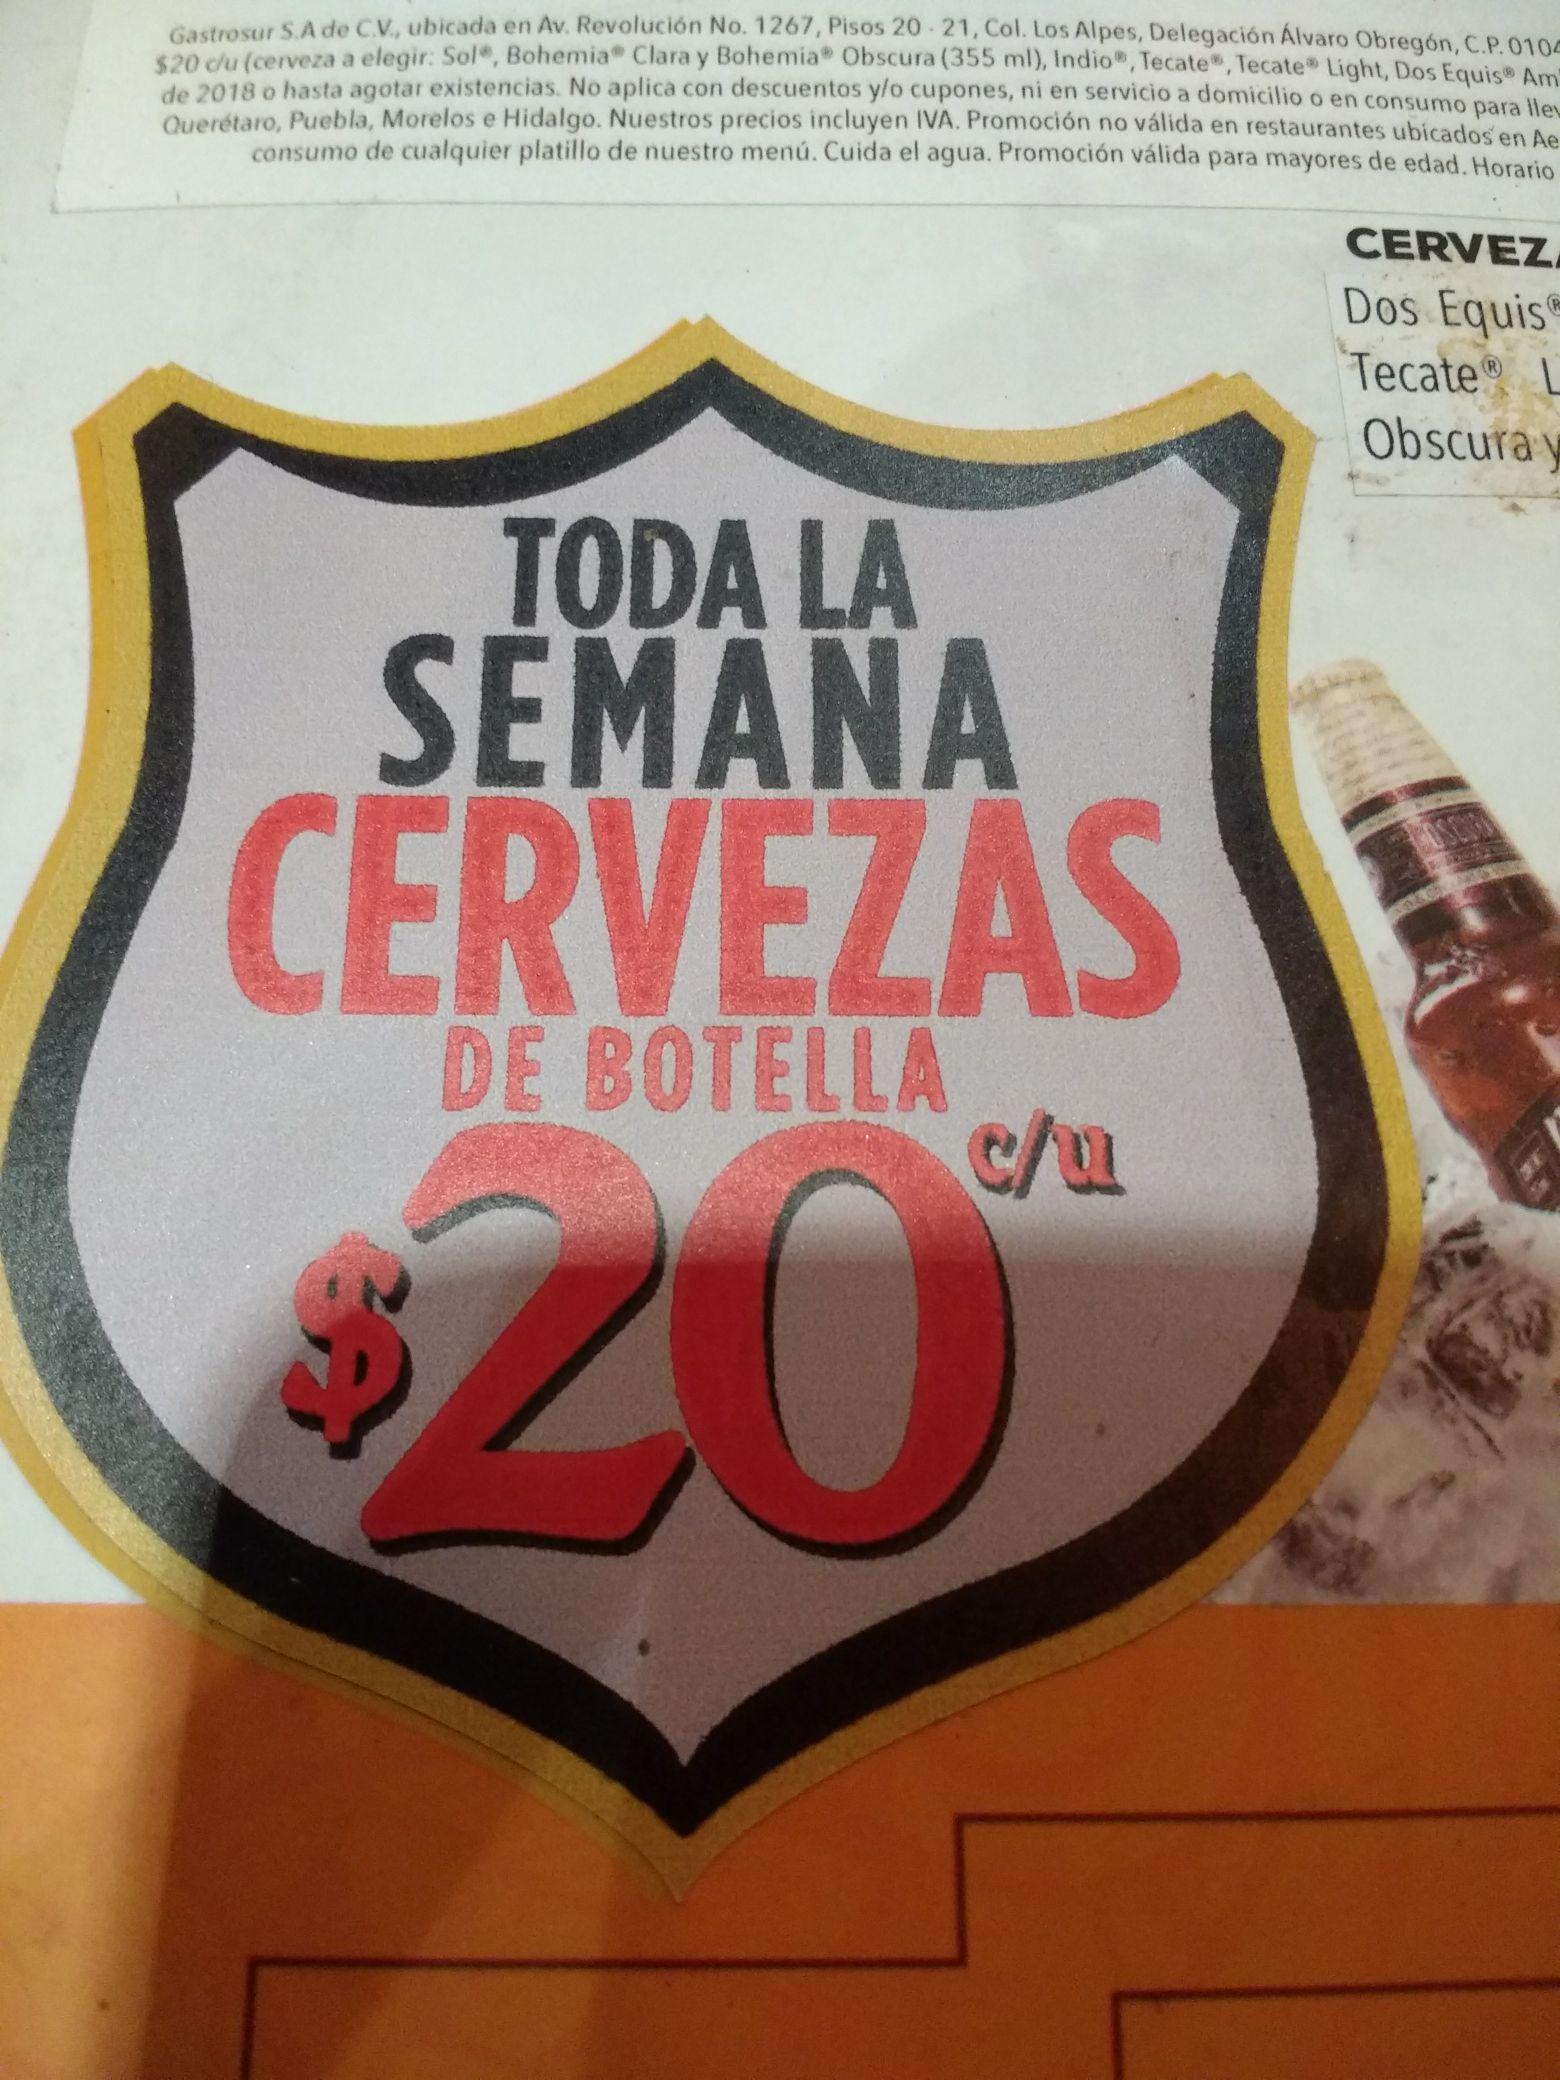 Chilis: Cervezas 20 pesos Toda la semana